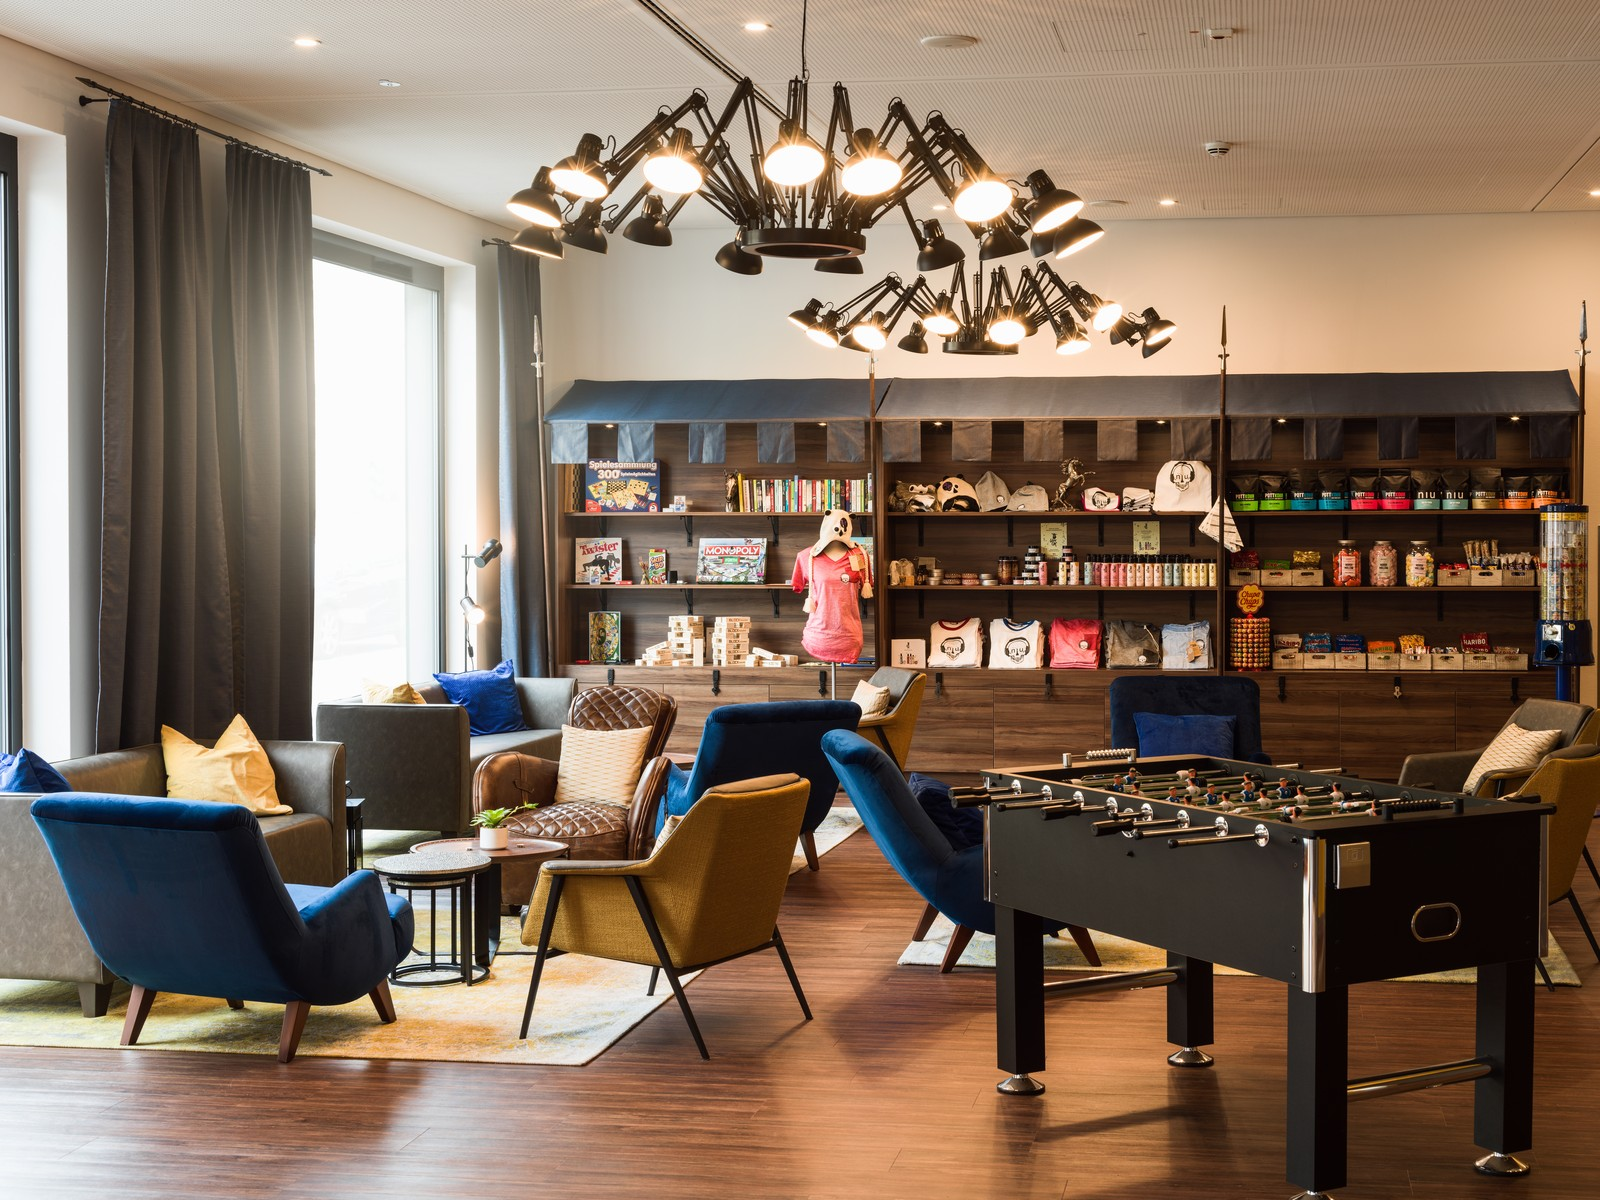 Hotels Novum Hospitality